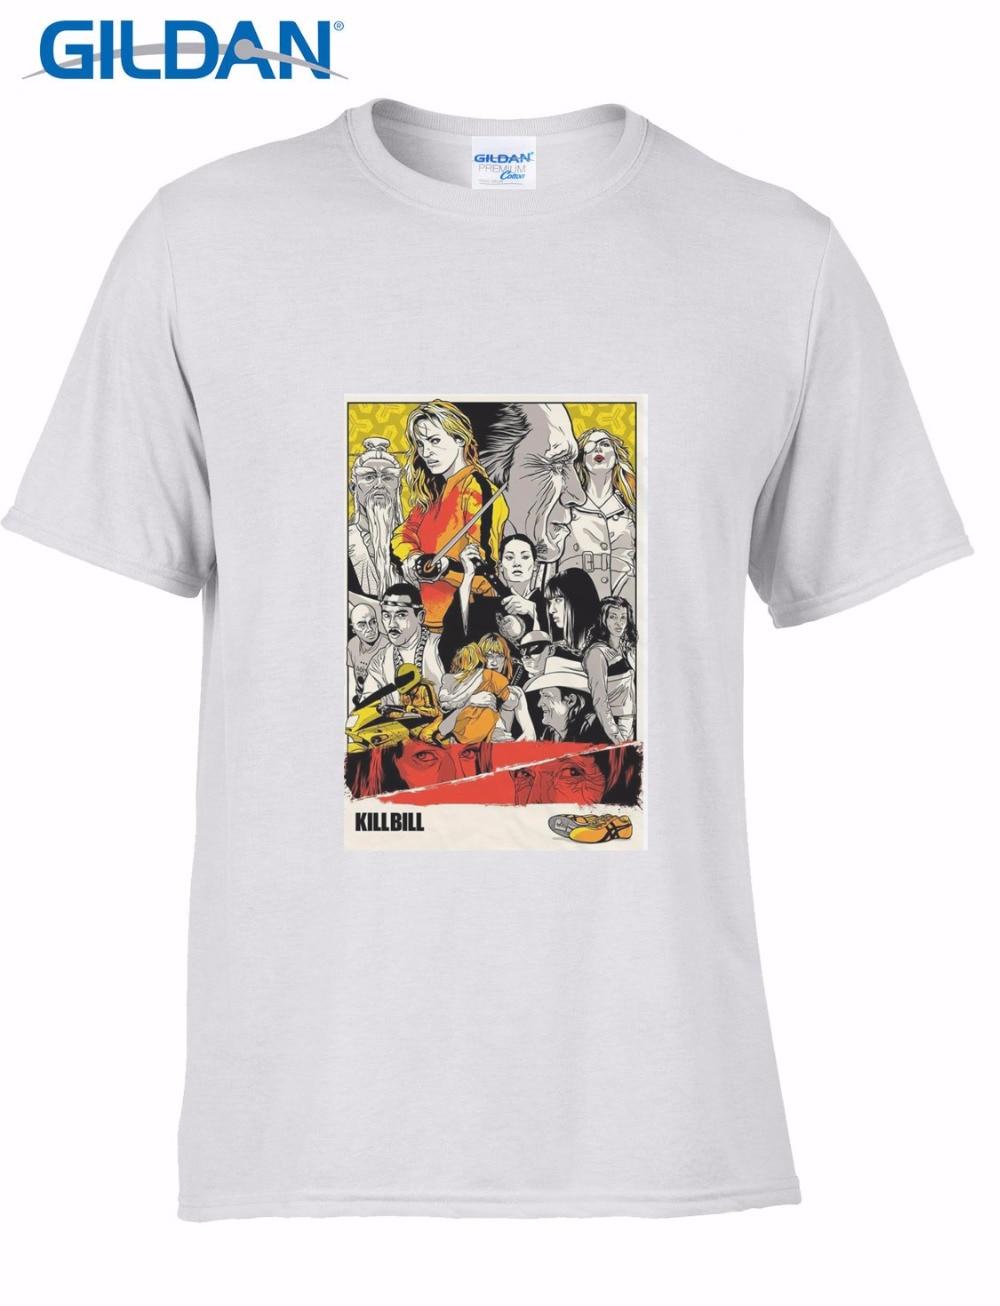 Nueva camiseta para hombre, camiseta Casual de verano para hombre, póster de película, camiseta de película de Halloween